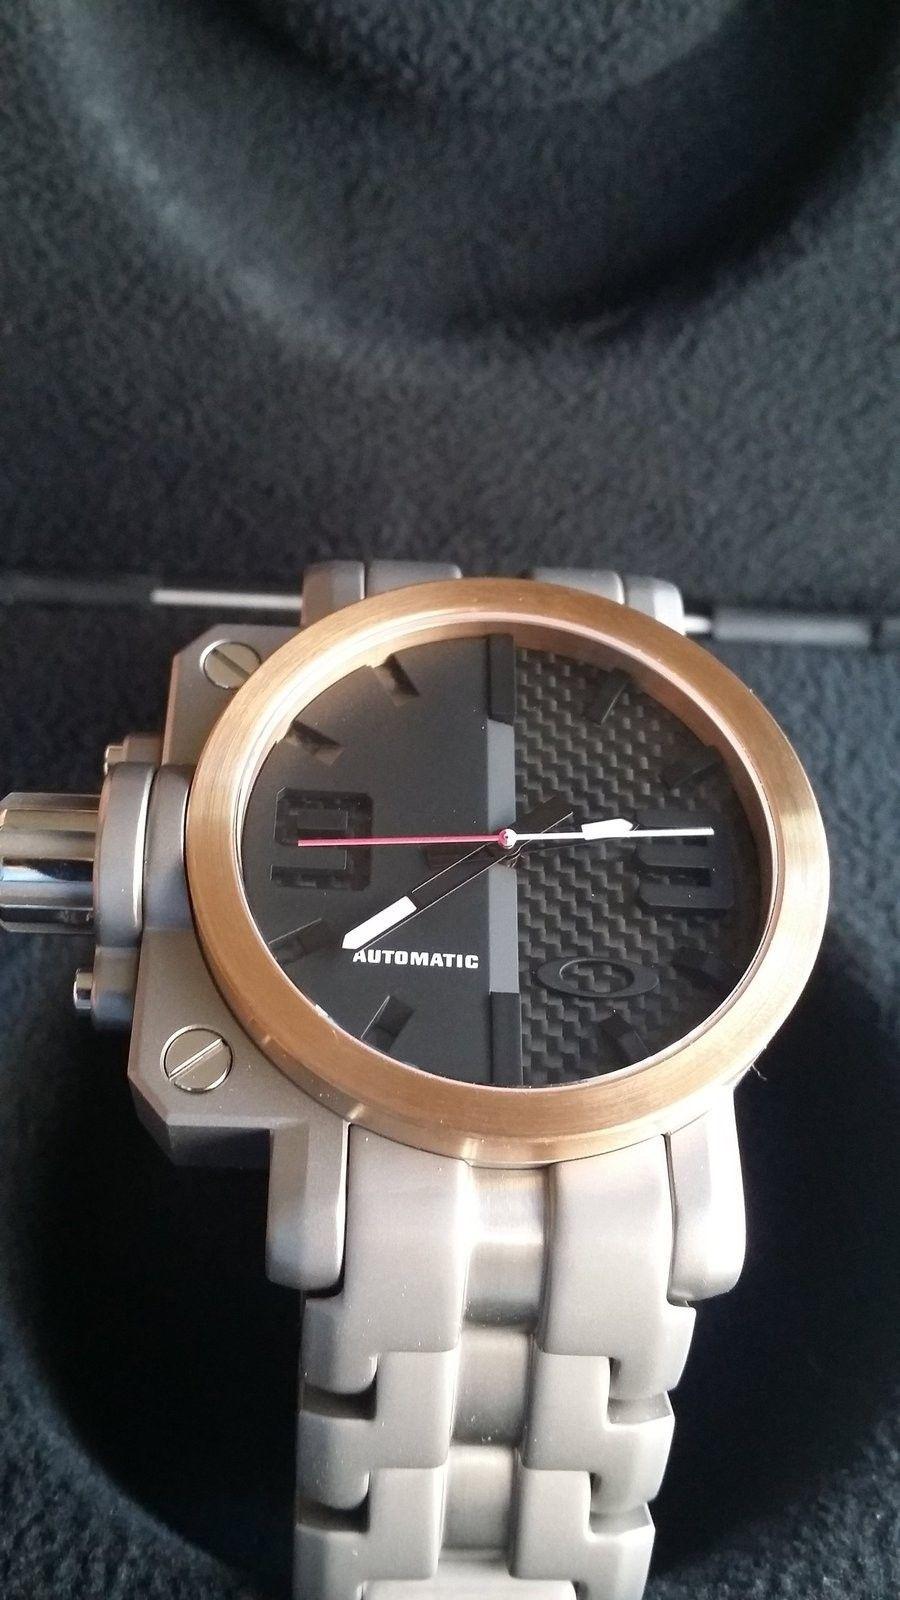 Gearbox Automatic Bracelet - 20150829_084547.jpg